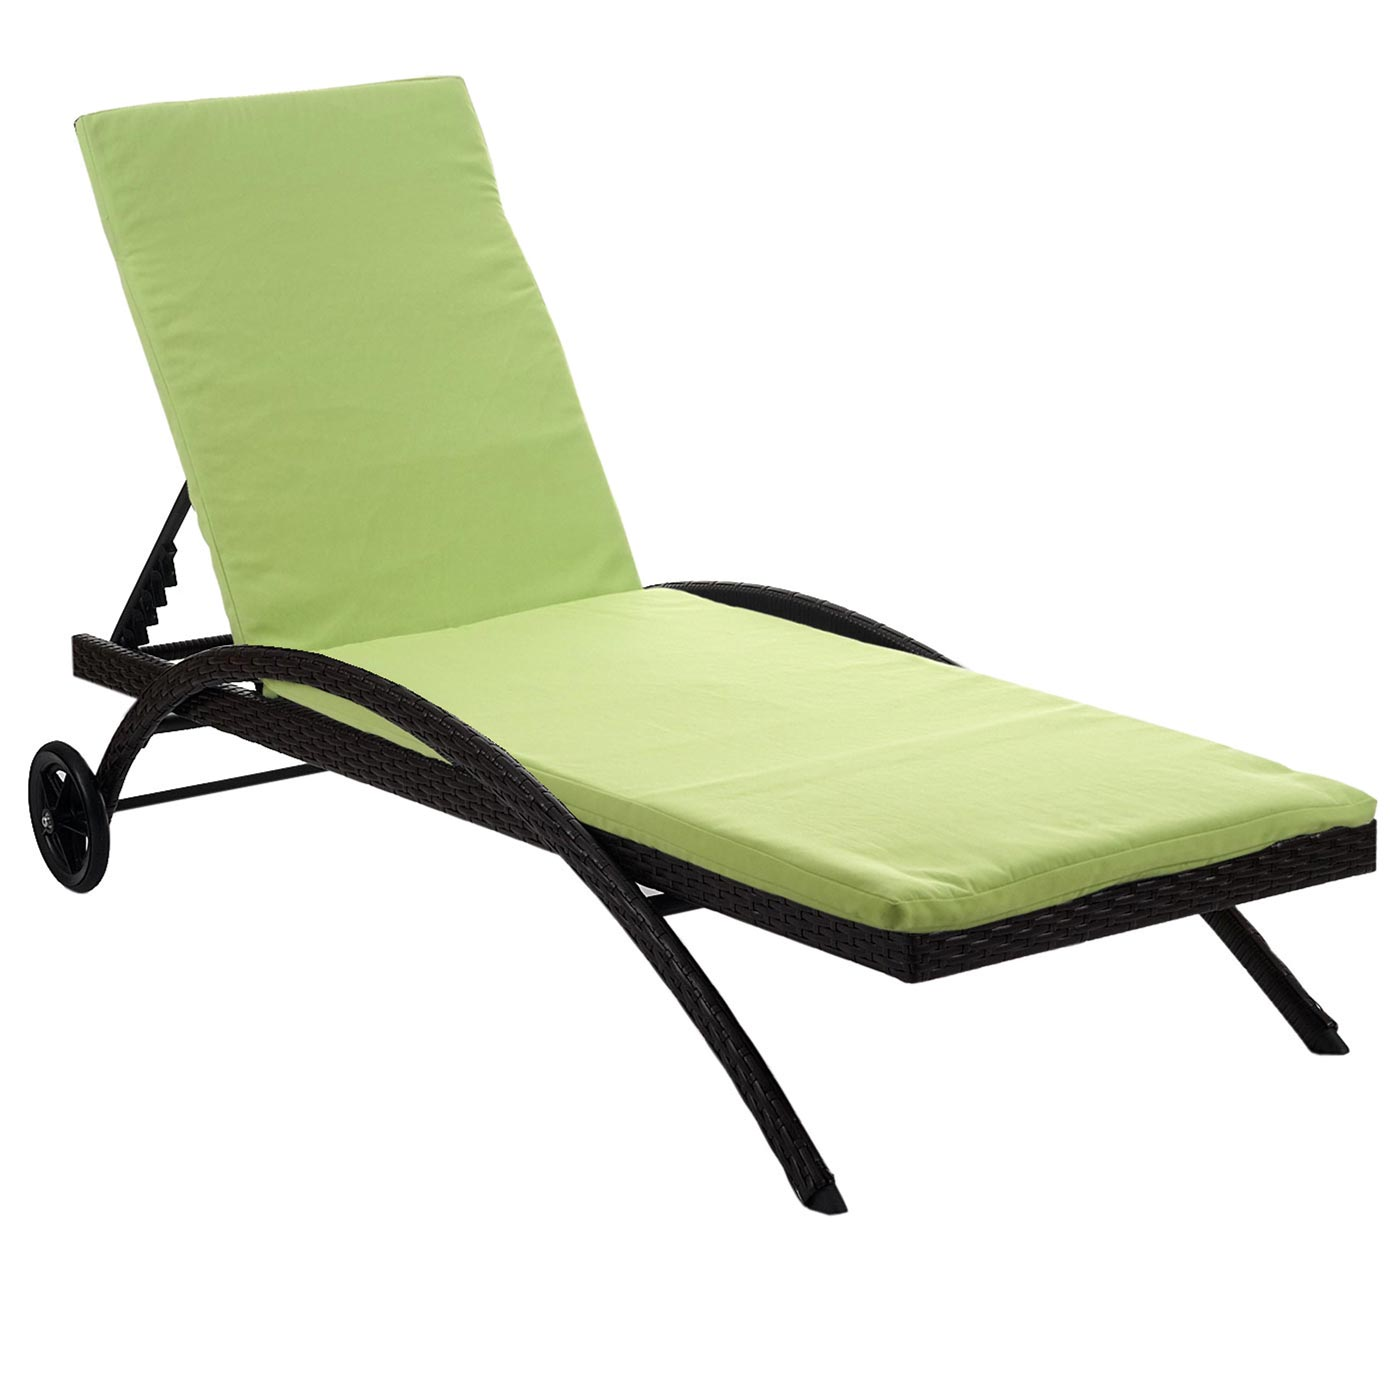 sonnenliege kastoria relaxliege gartenliege poly rattan rundes rattan. Black Bedroom Furniture Sets. Home Design Ideas